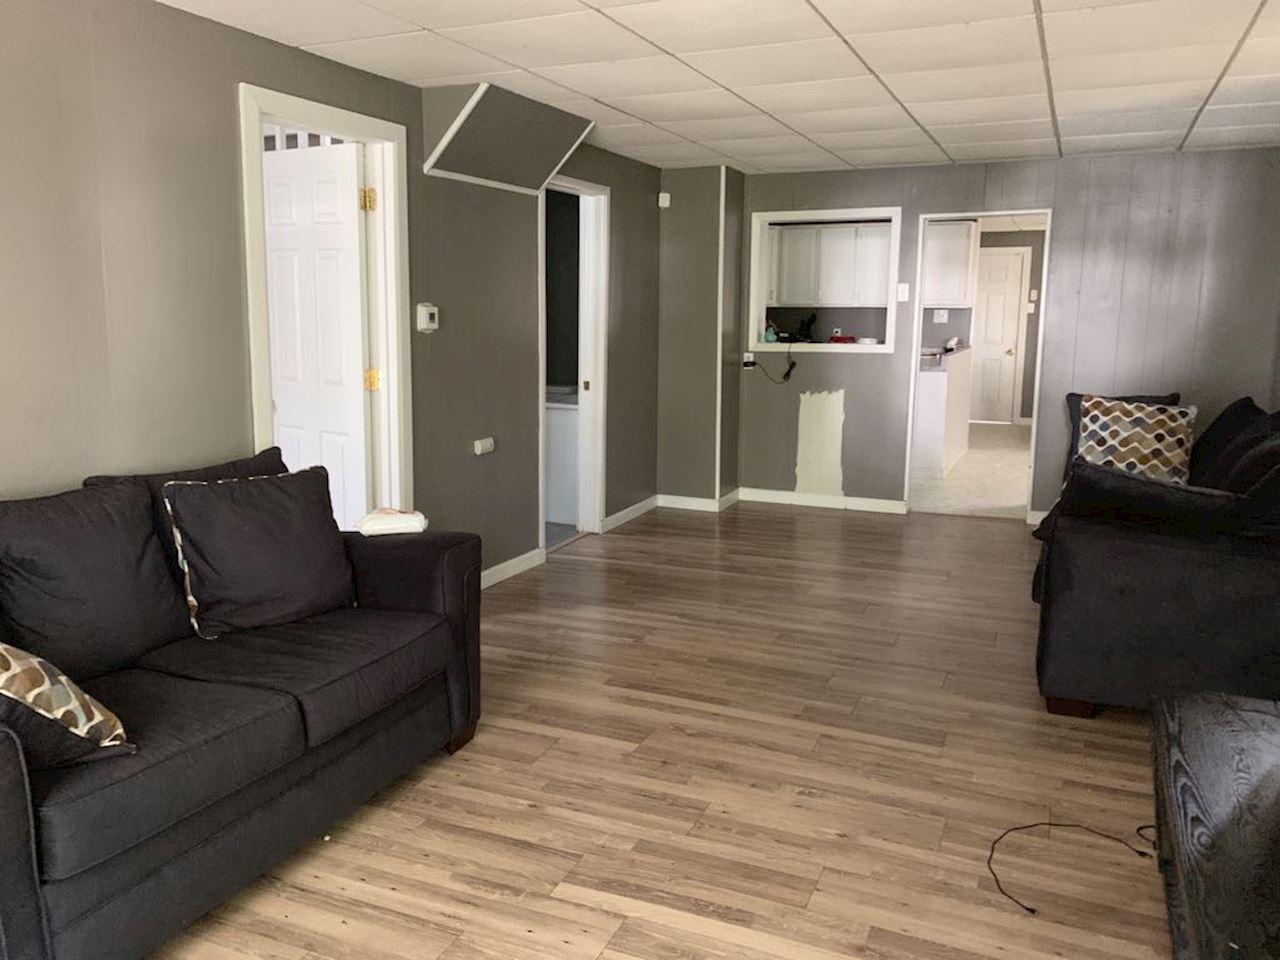 investment property - 142 Jackson St, Michigan City, IN 46360, La Porte - image 5